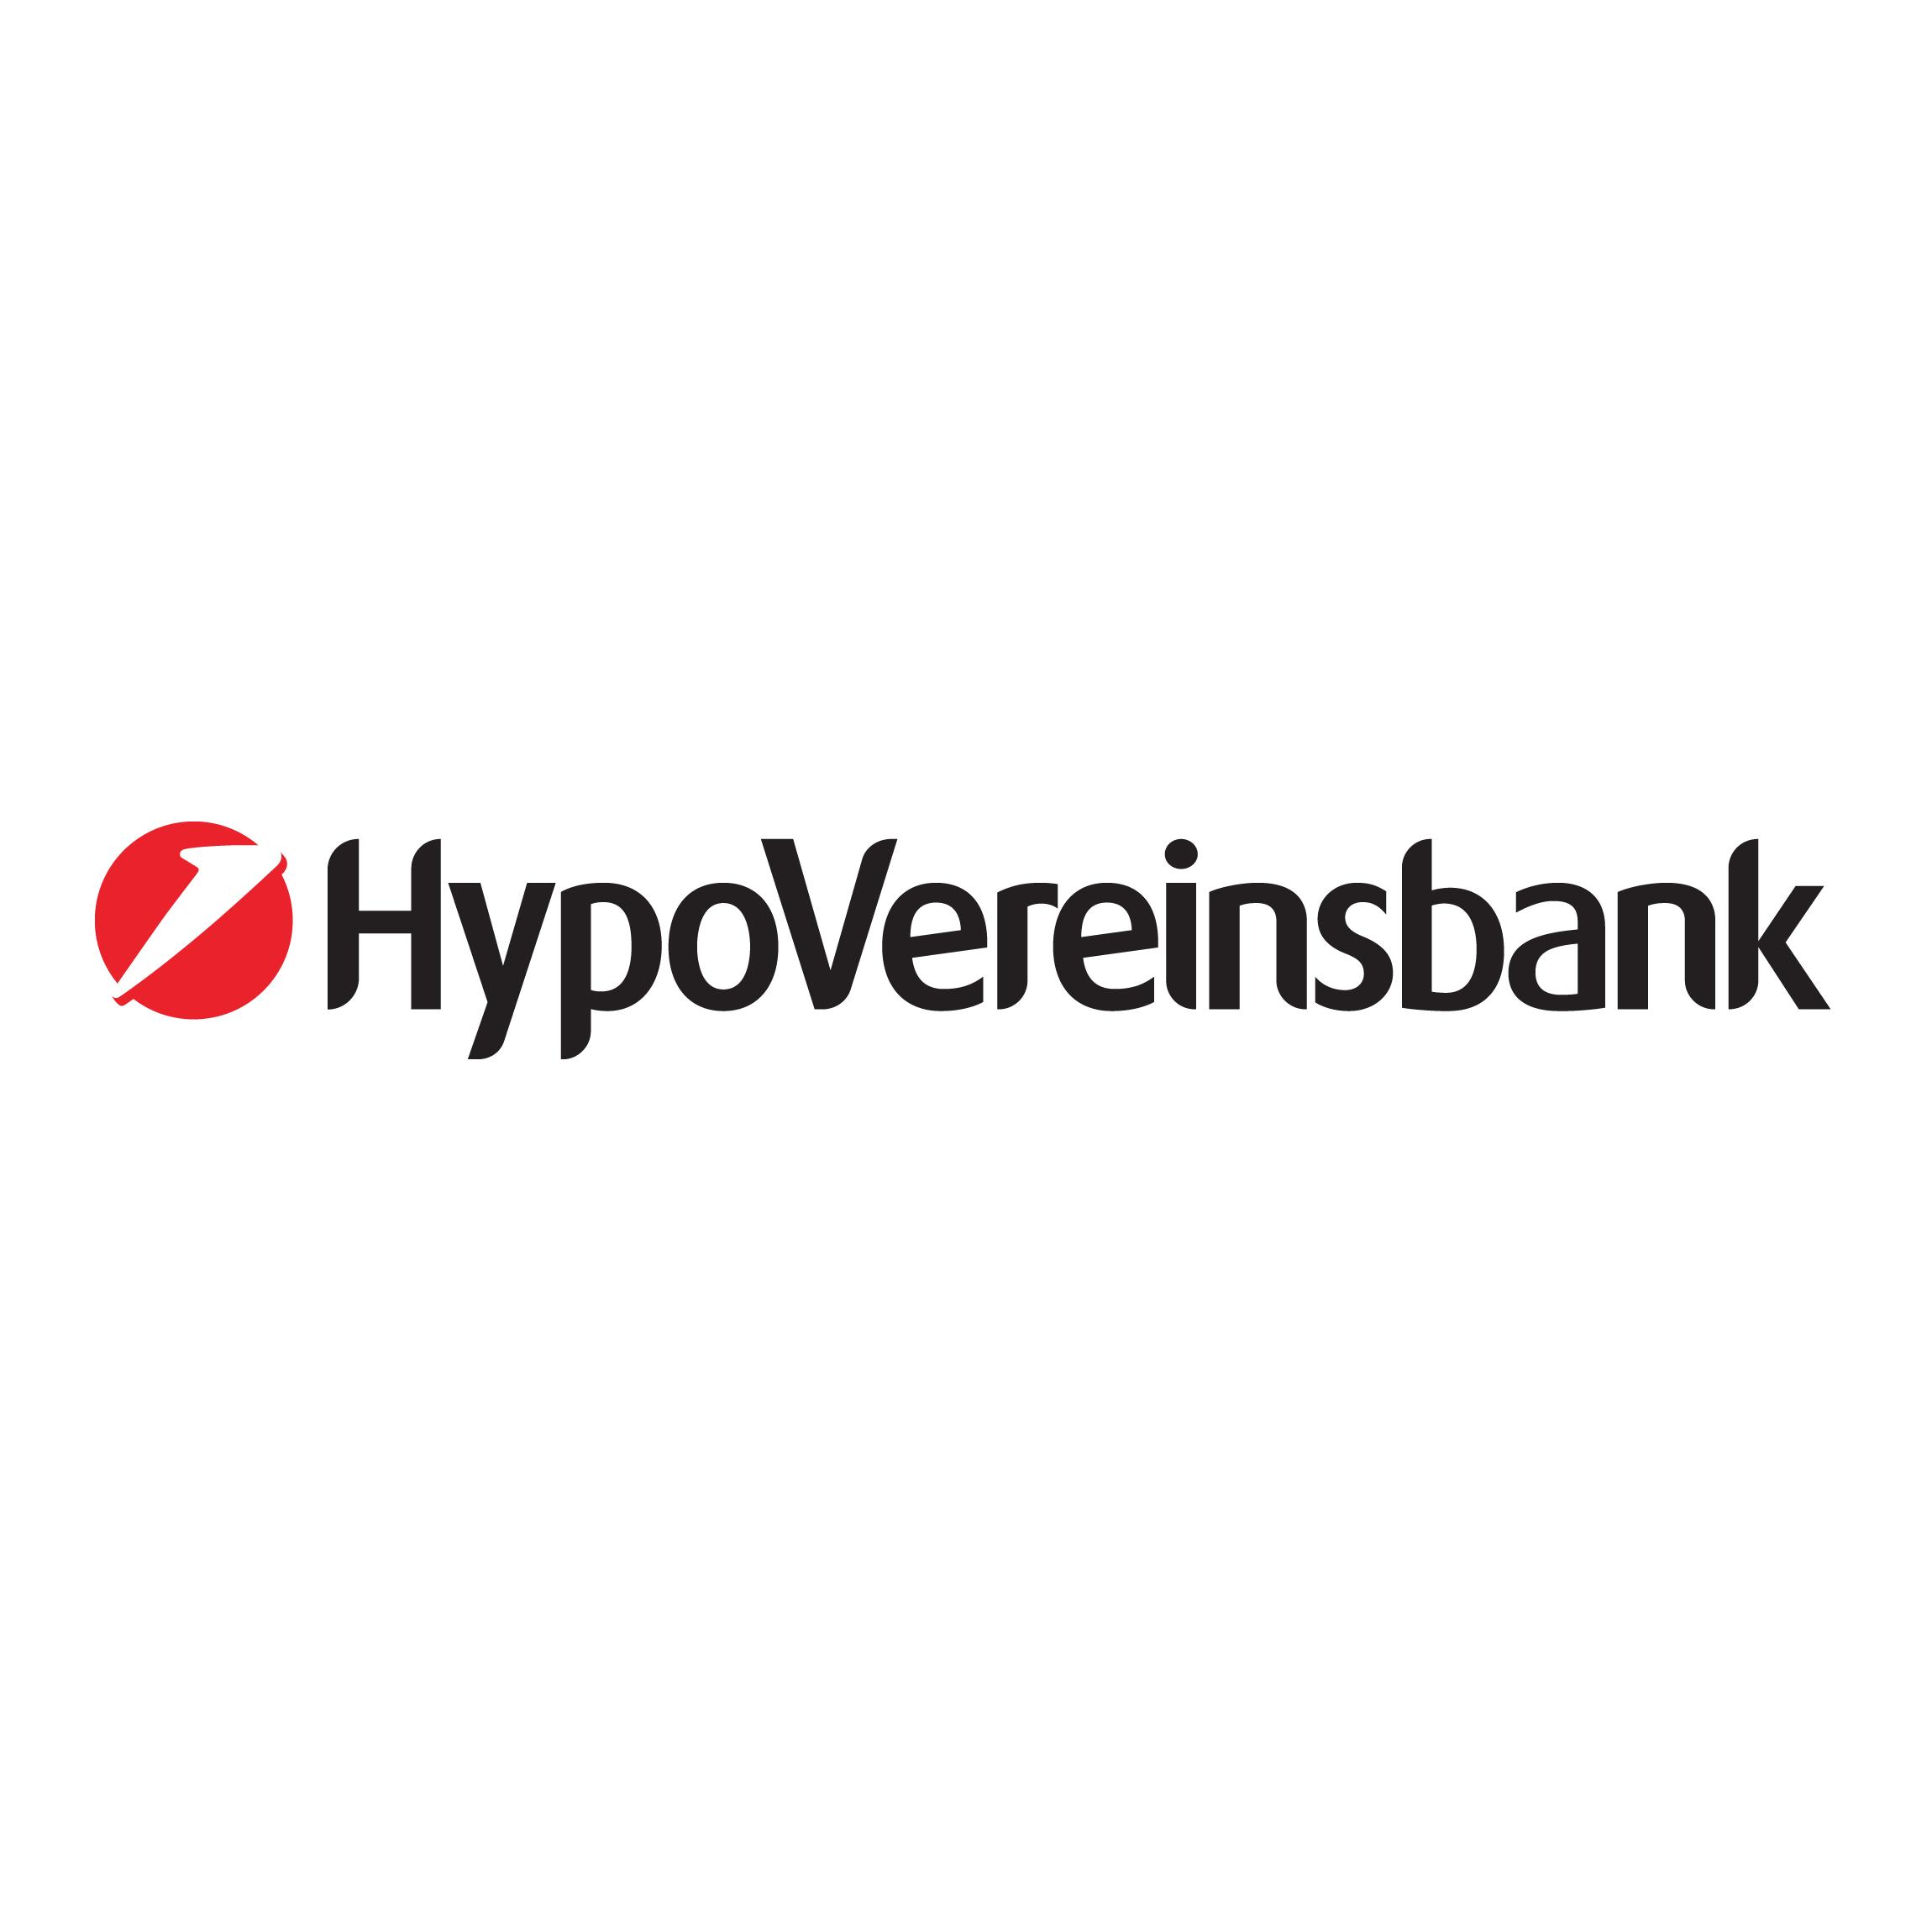 HypoVereinsbank Private Banking Regensburg